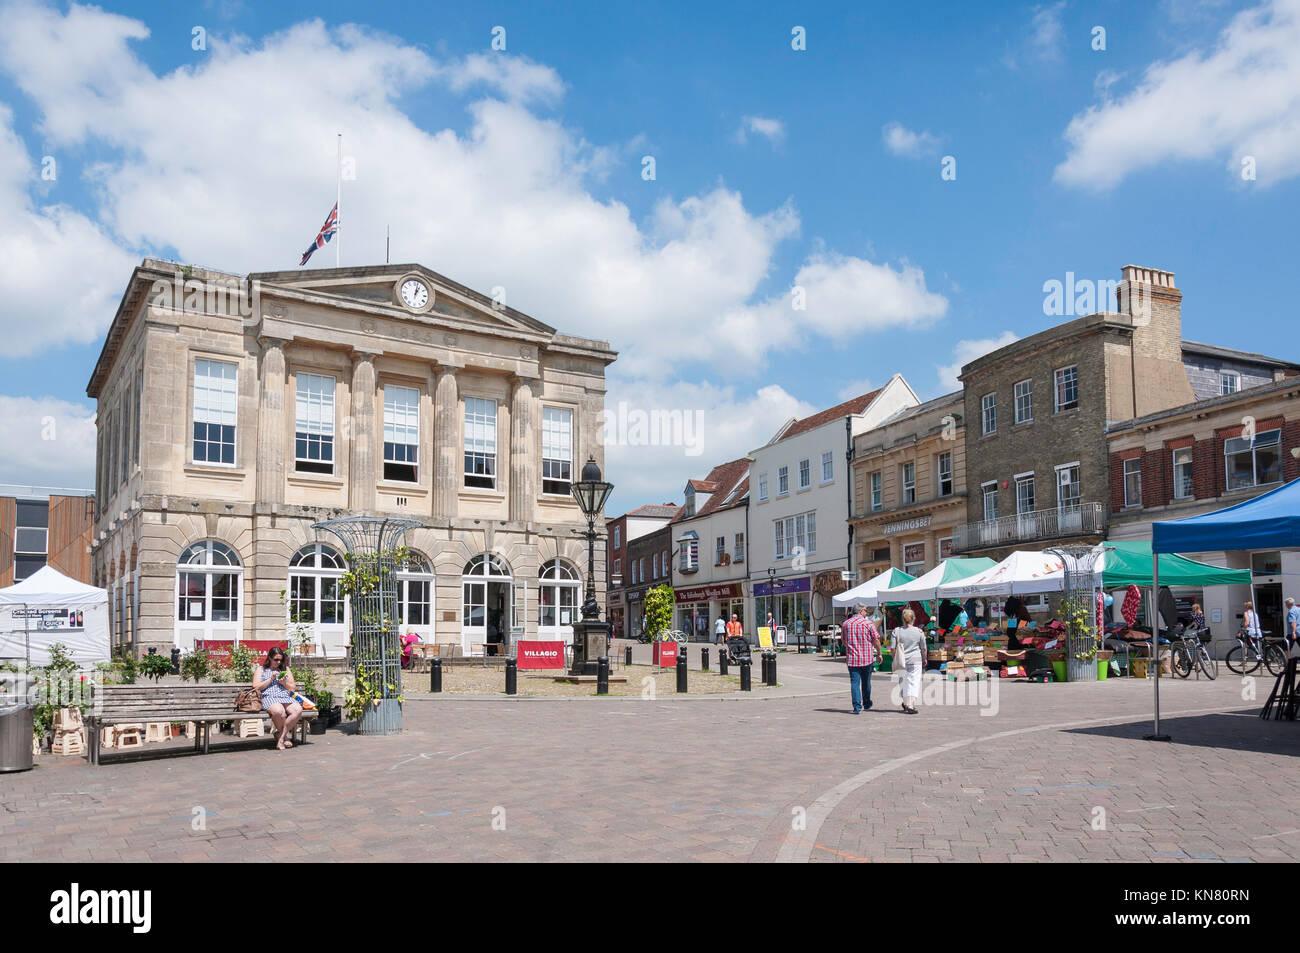 Andover Guildhall, High Street, Andover, Hampshire, England, United Kingdom - Stock Image